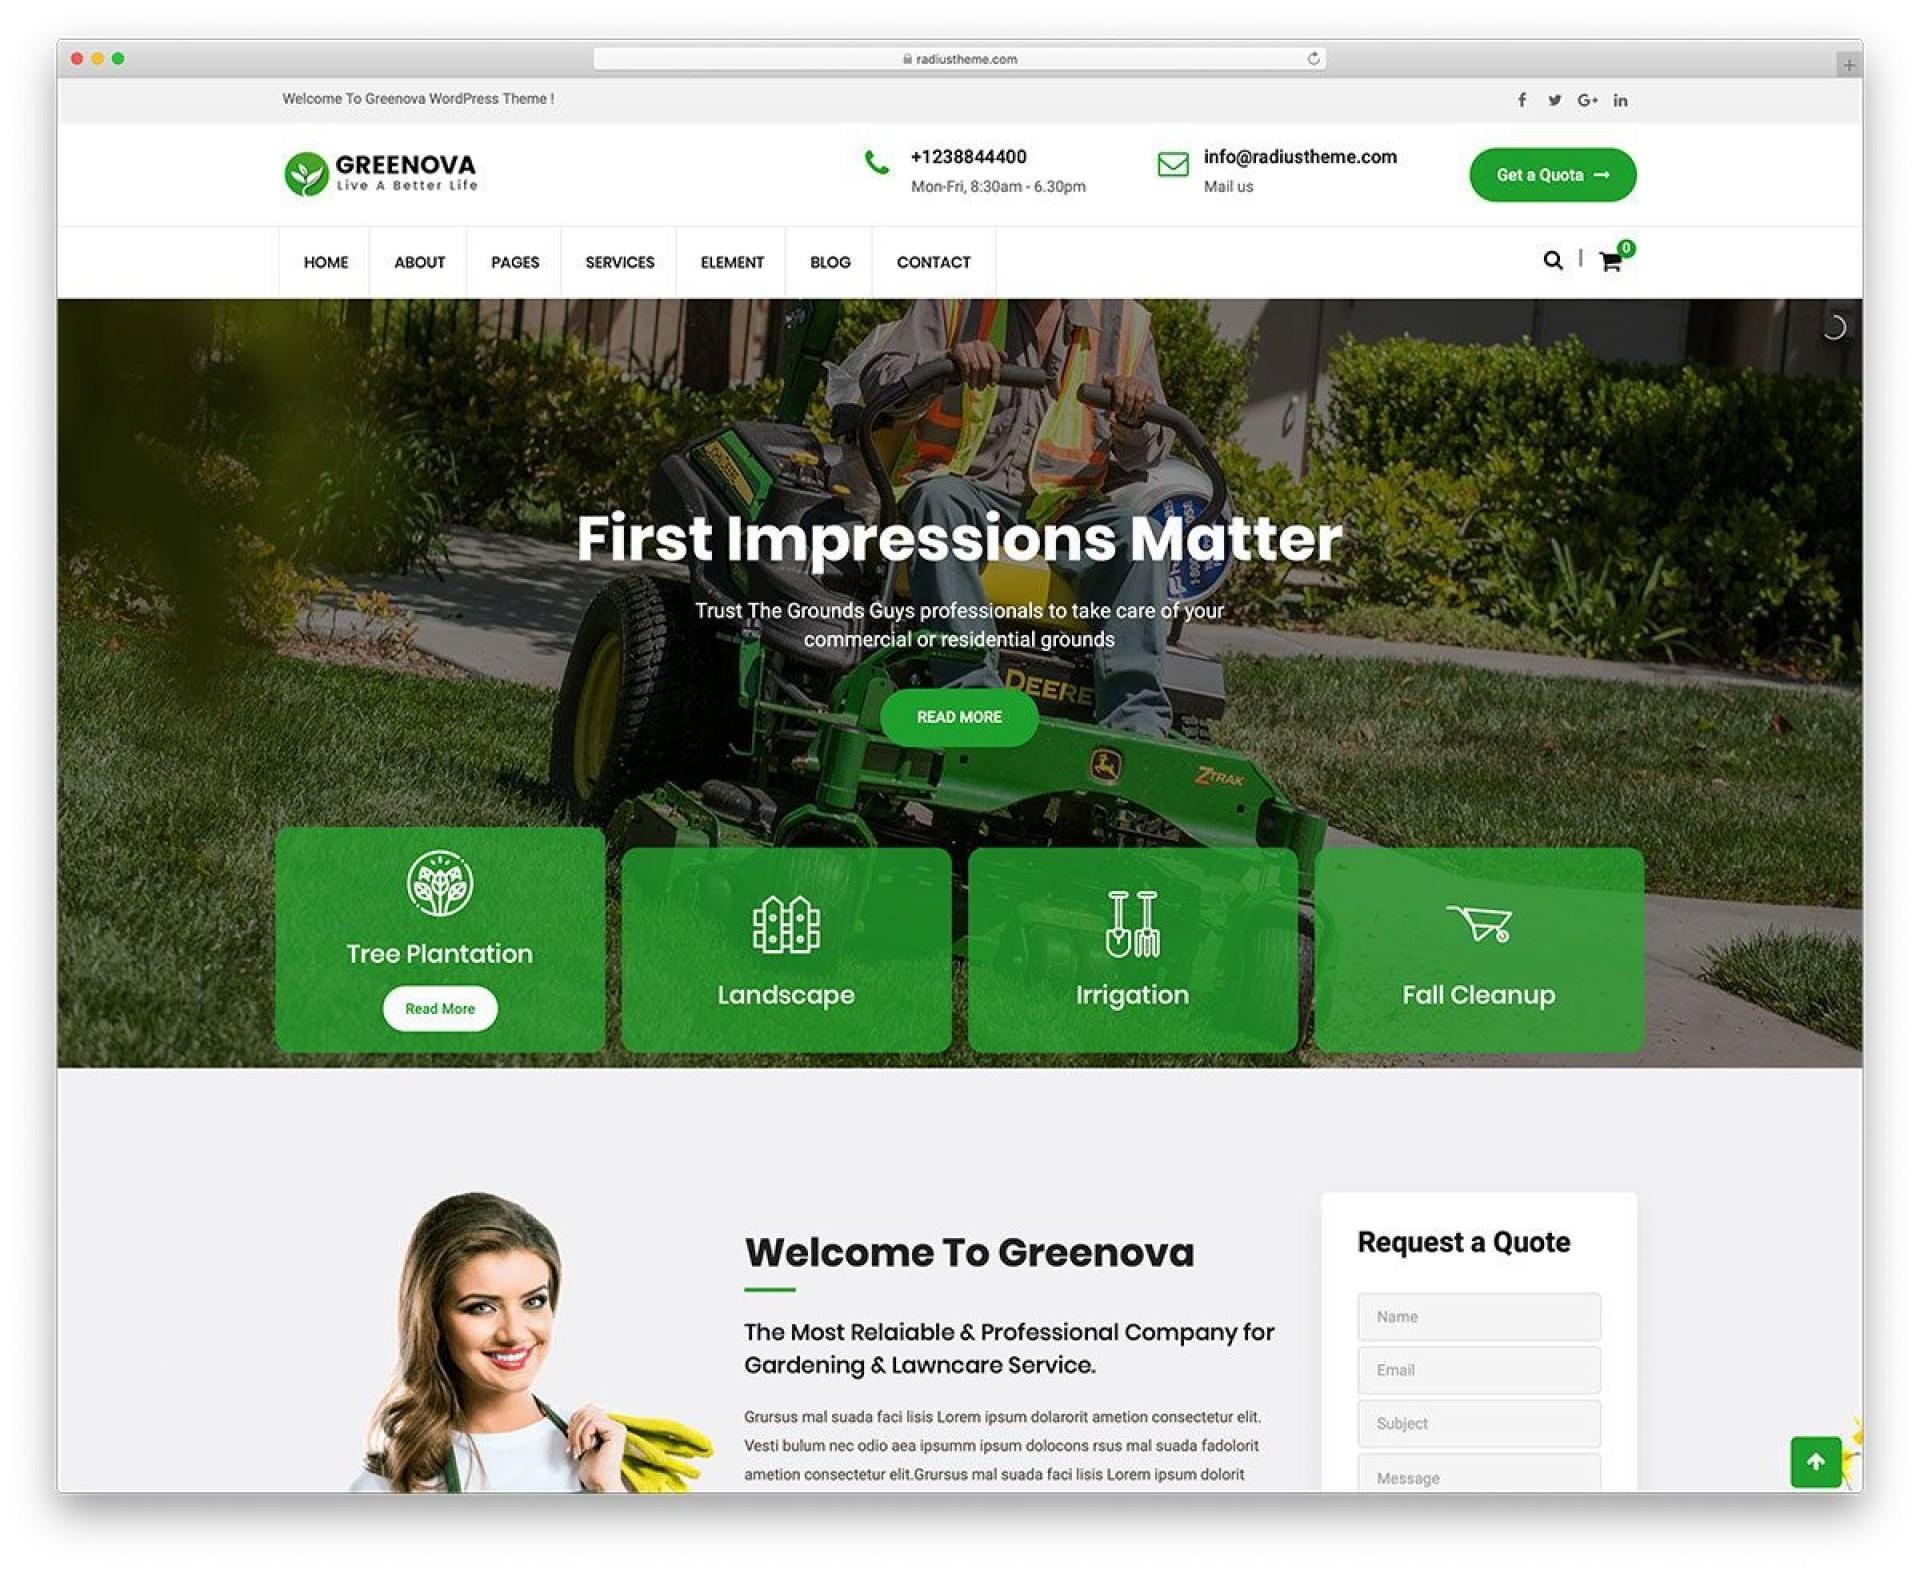 006 Best Lawn Care Website Template Sample 1920